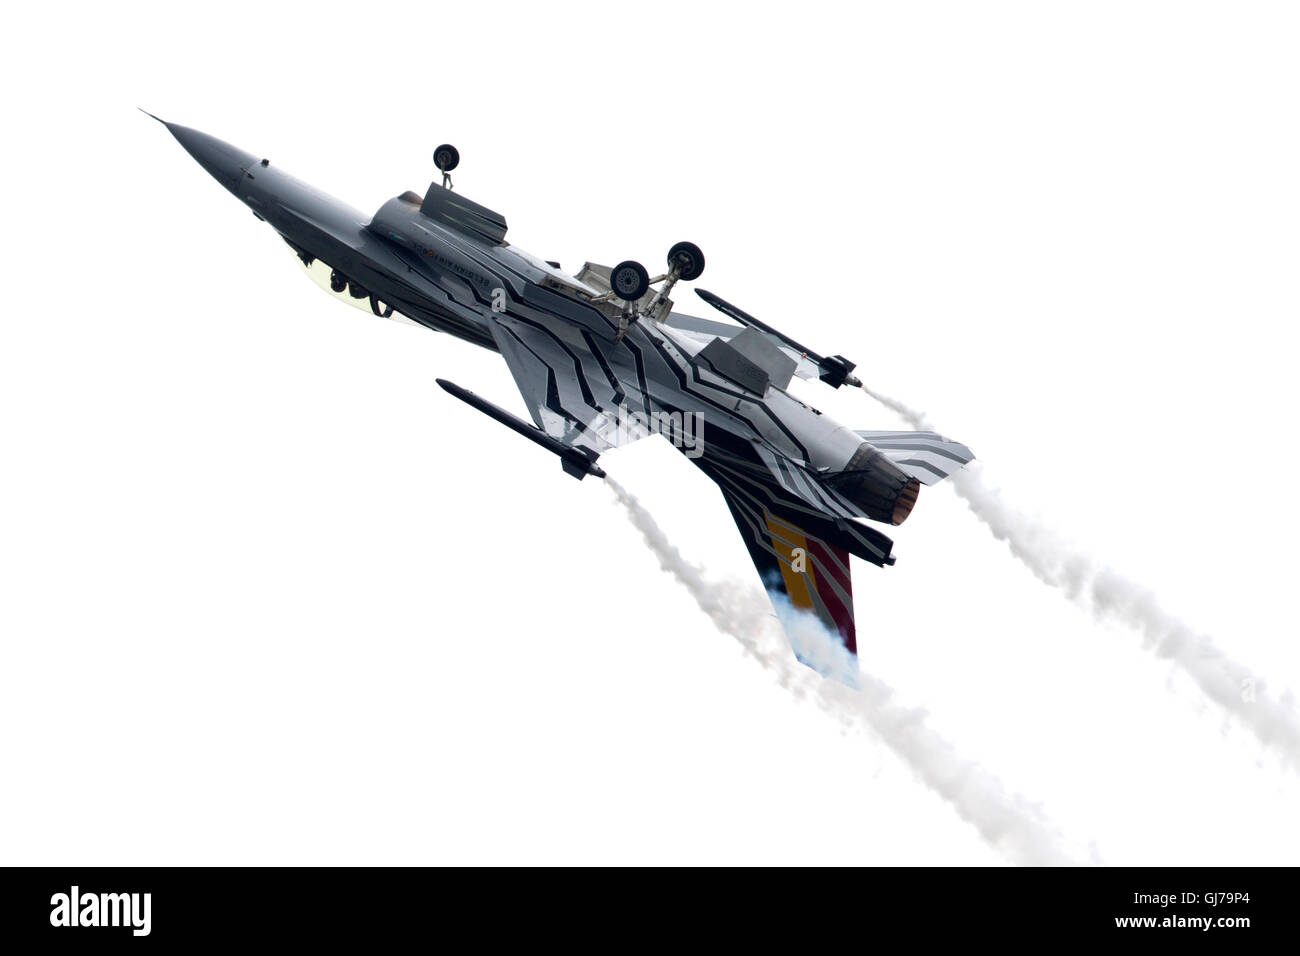 Force Aérienne Belge BAF F-16AM Fighting Falcon 350 Sqn/10 Gizmo Aile de Moortel Au RIAT 2016 Royal International Air Tattoo Banque D'Images